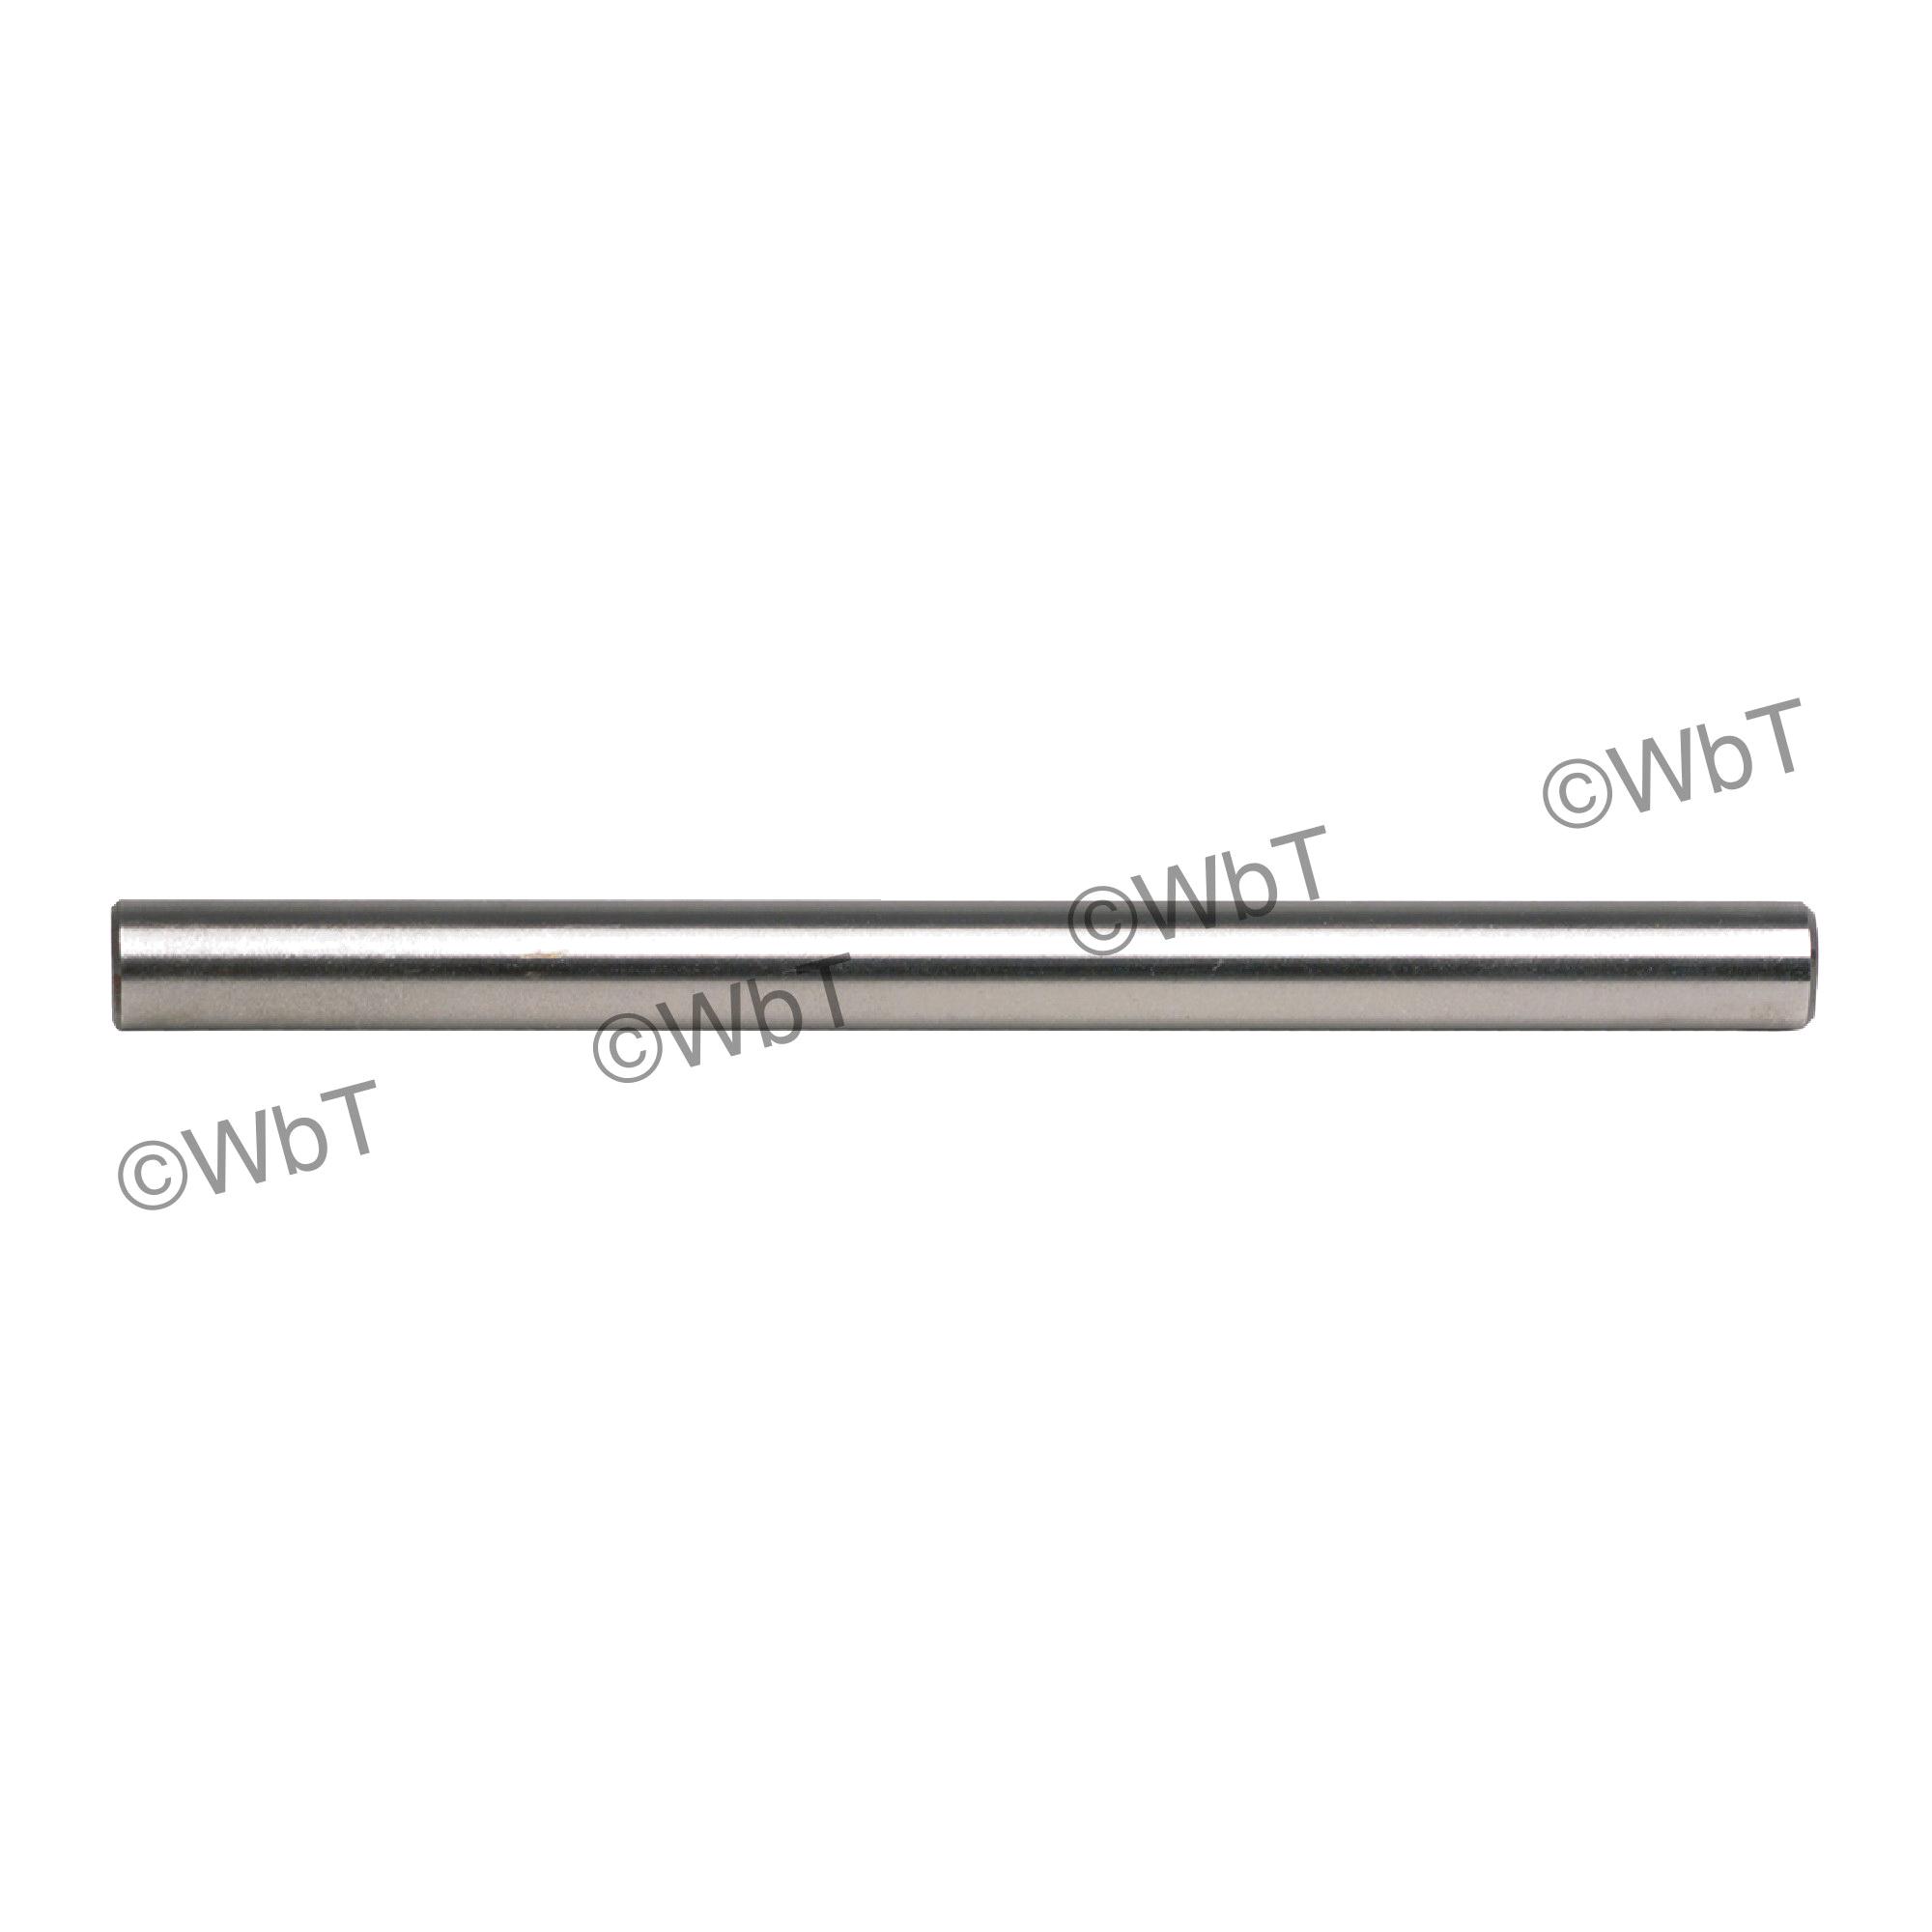 TTC 01-100-008 A20 General Purpose Jobbers Length Straight Shank Drill Blank, 2-3/4 in L, HSS